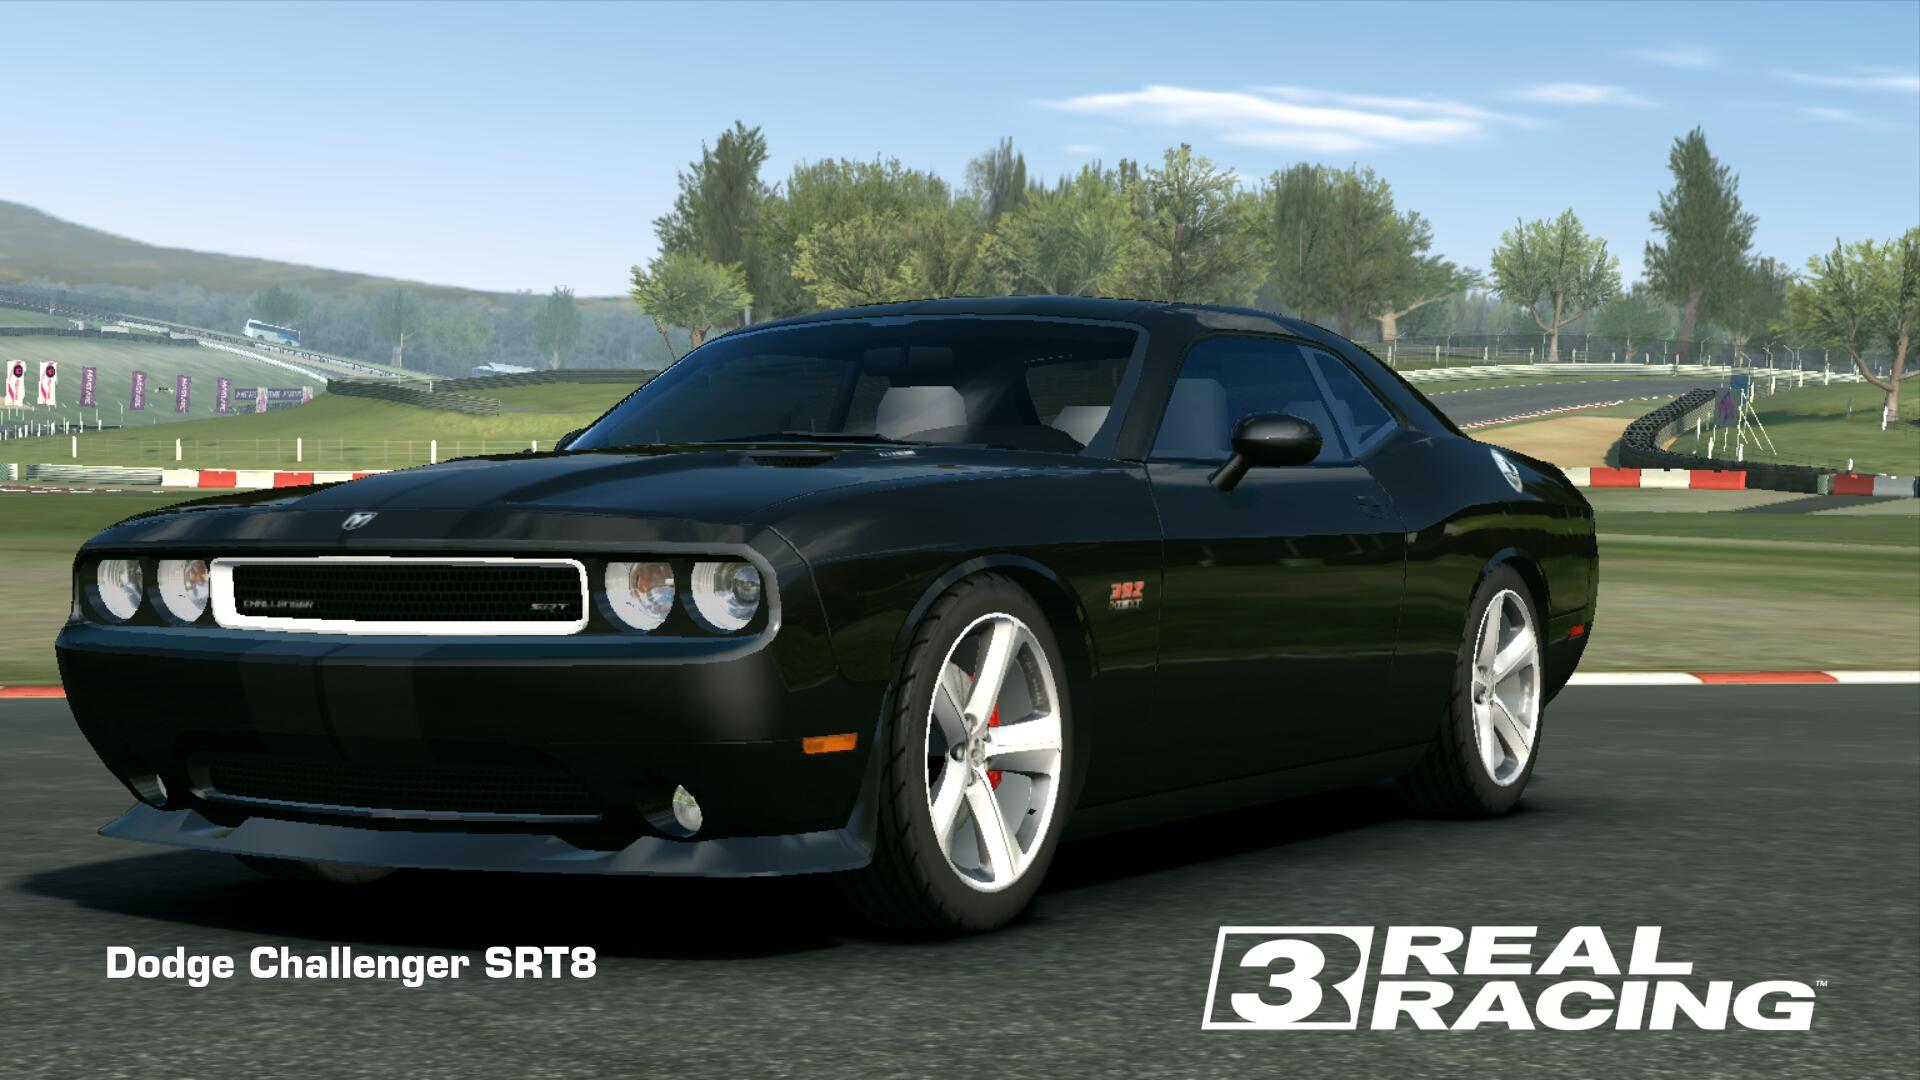 Amazing Dodge Challenger SRT8 Pictures & Backgrounds